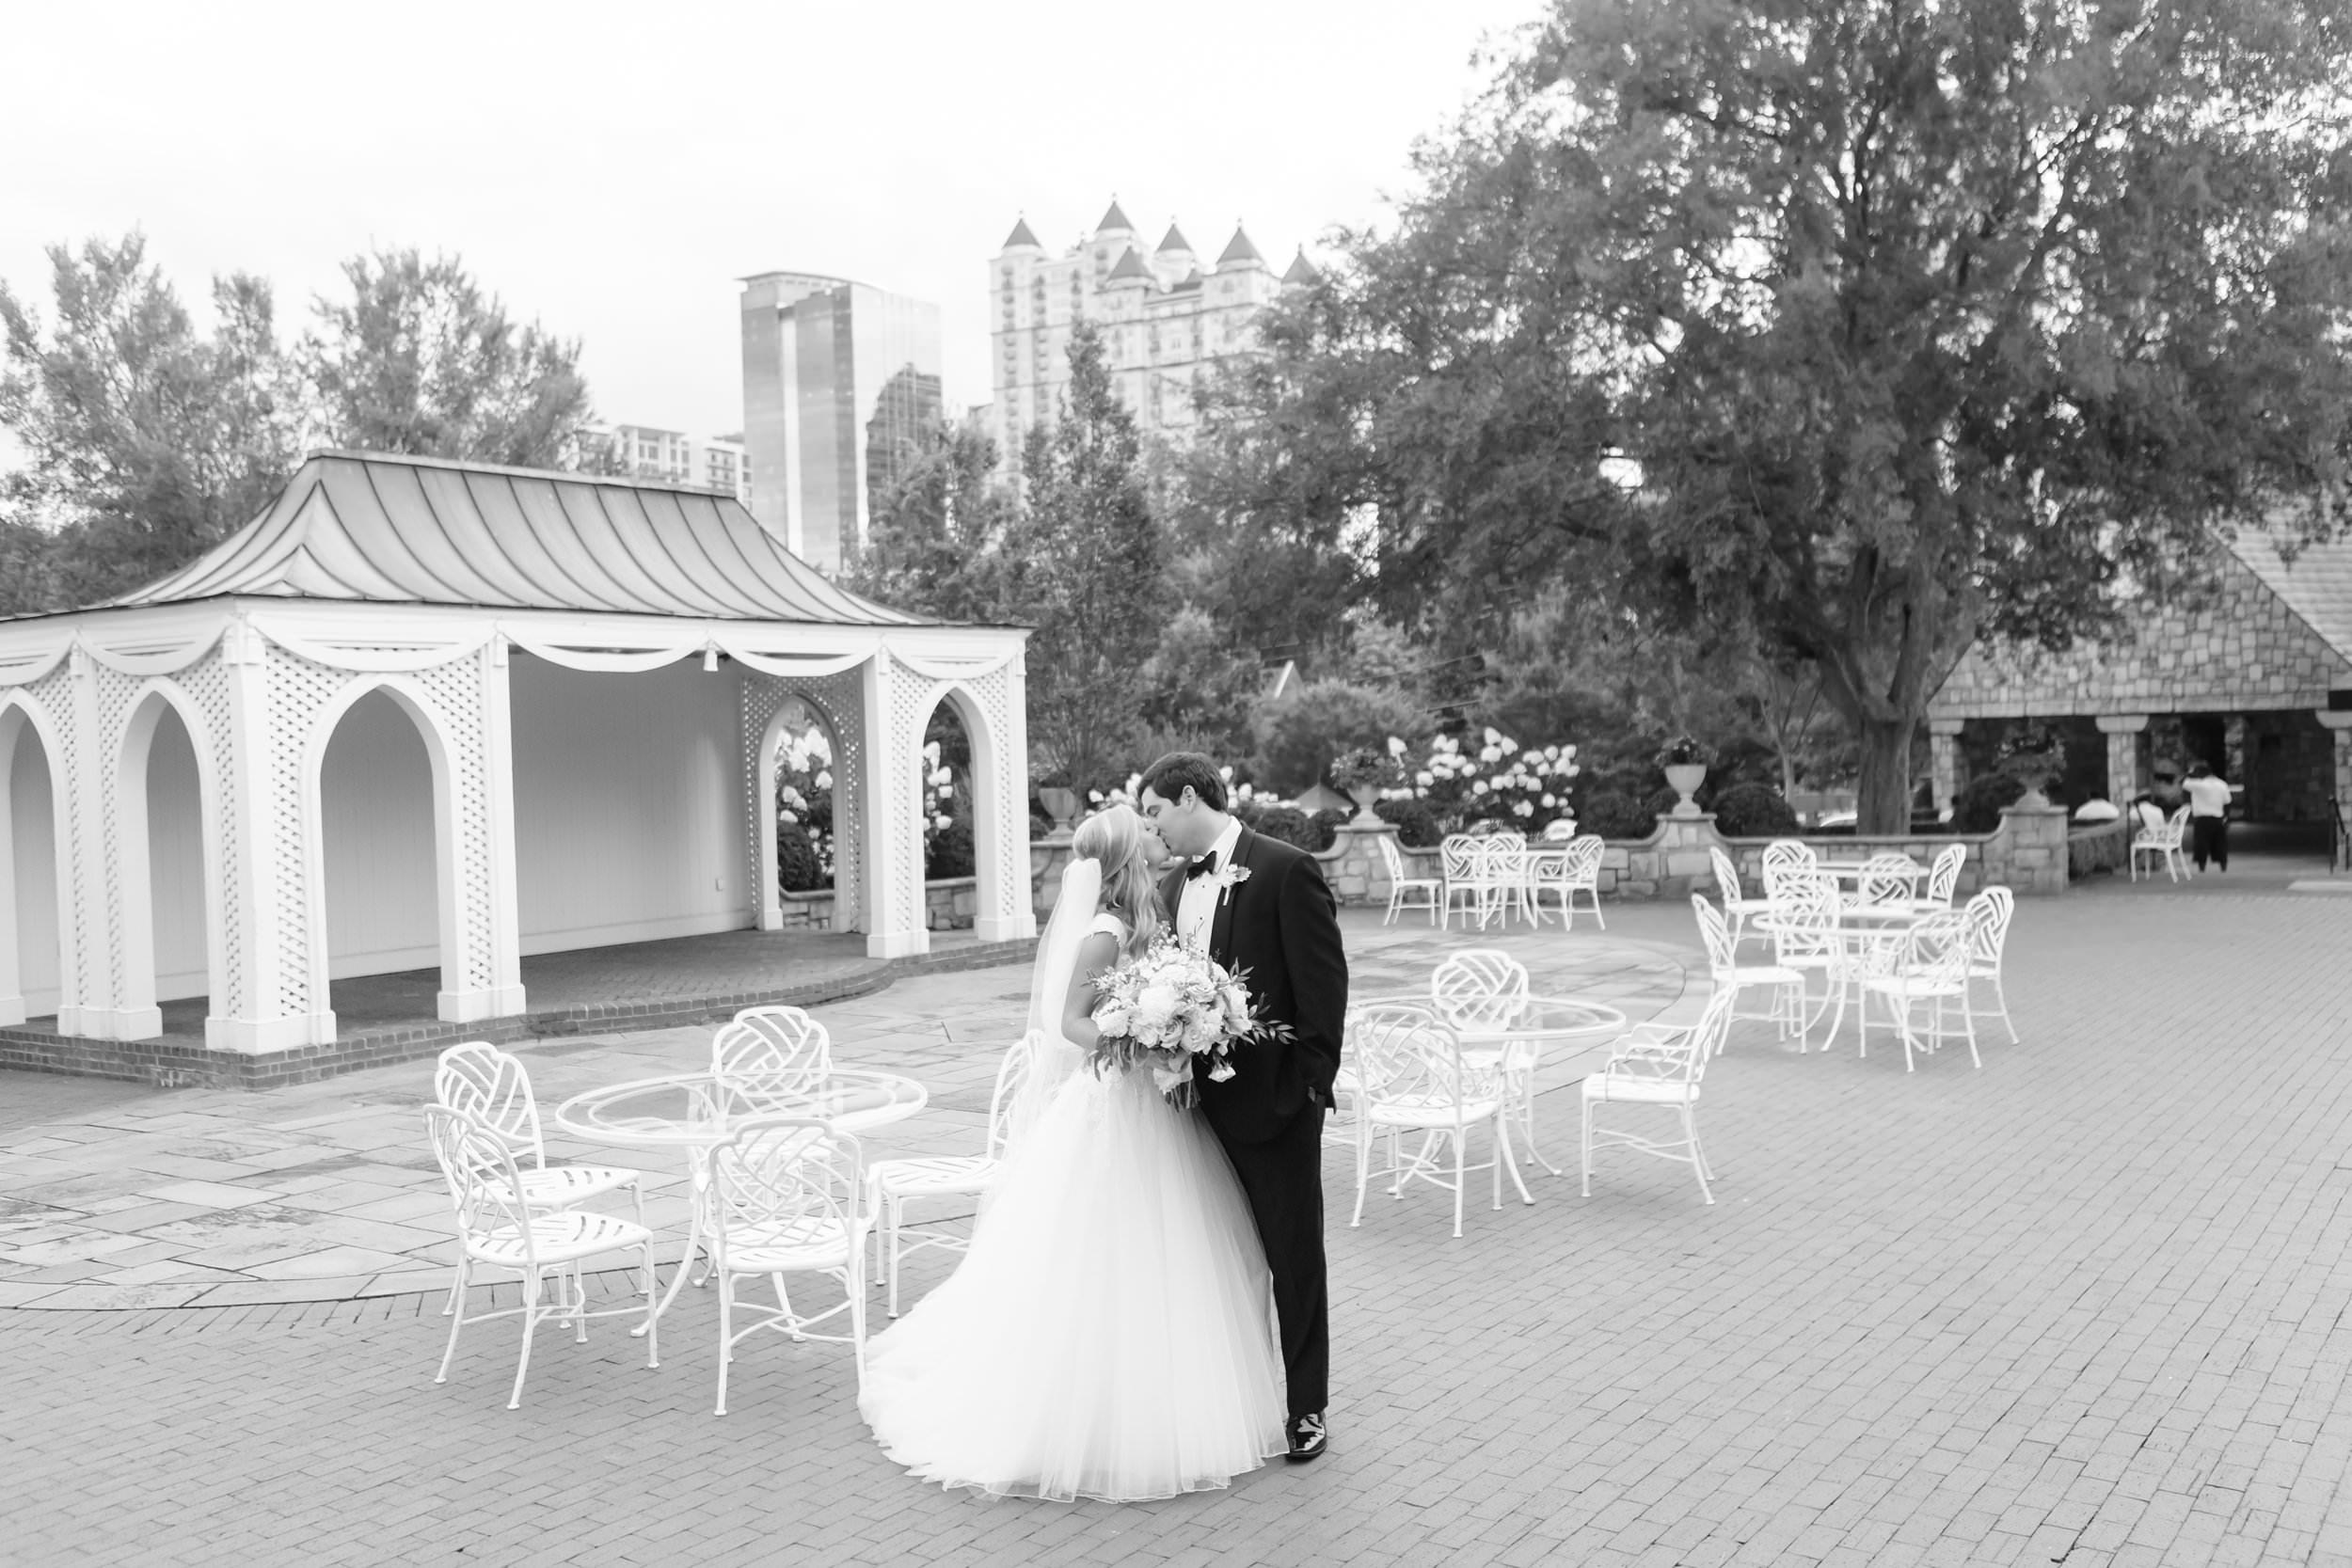 Piedmont-Driving-Club-Wedding-Photos046.jpg